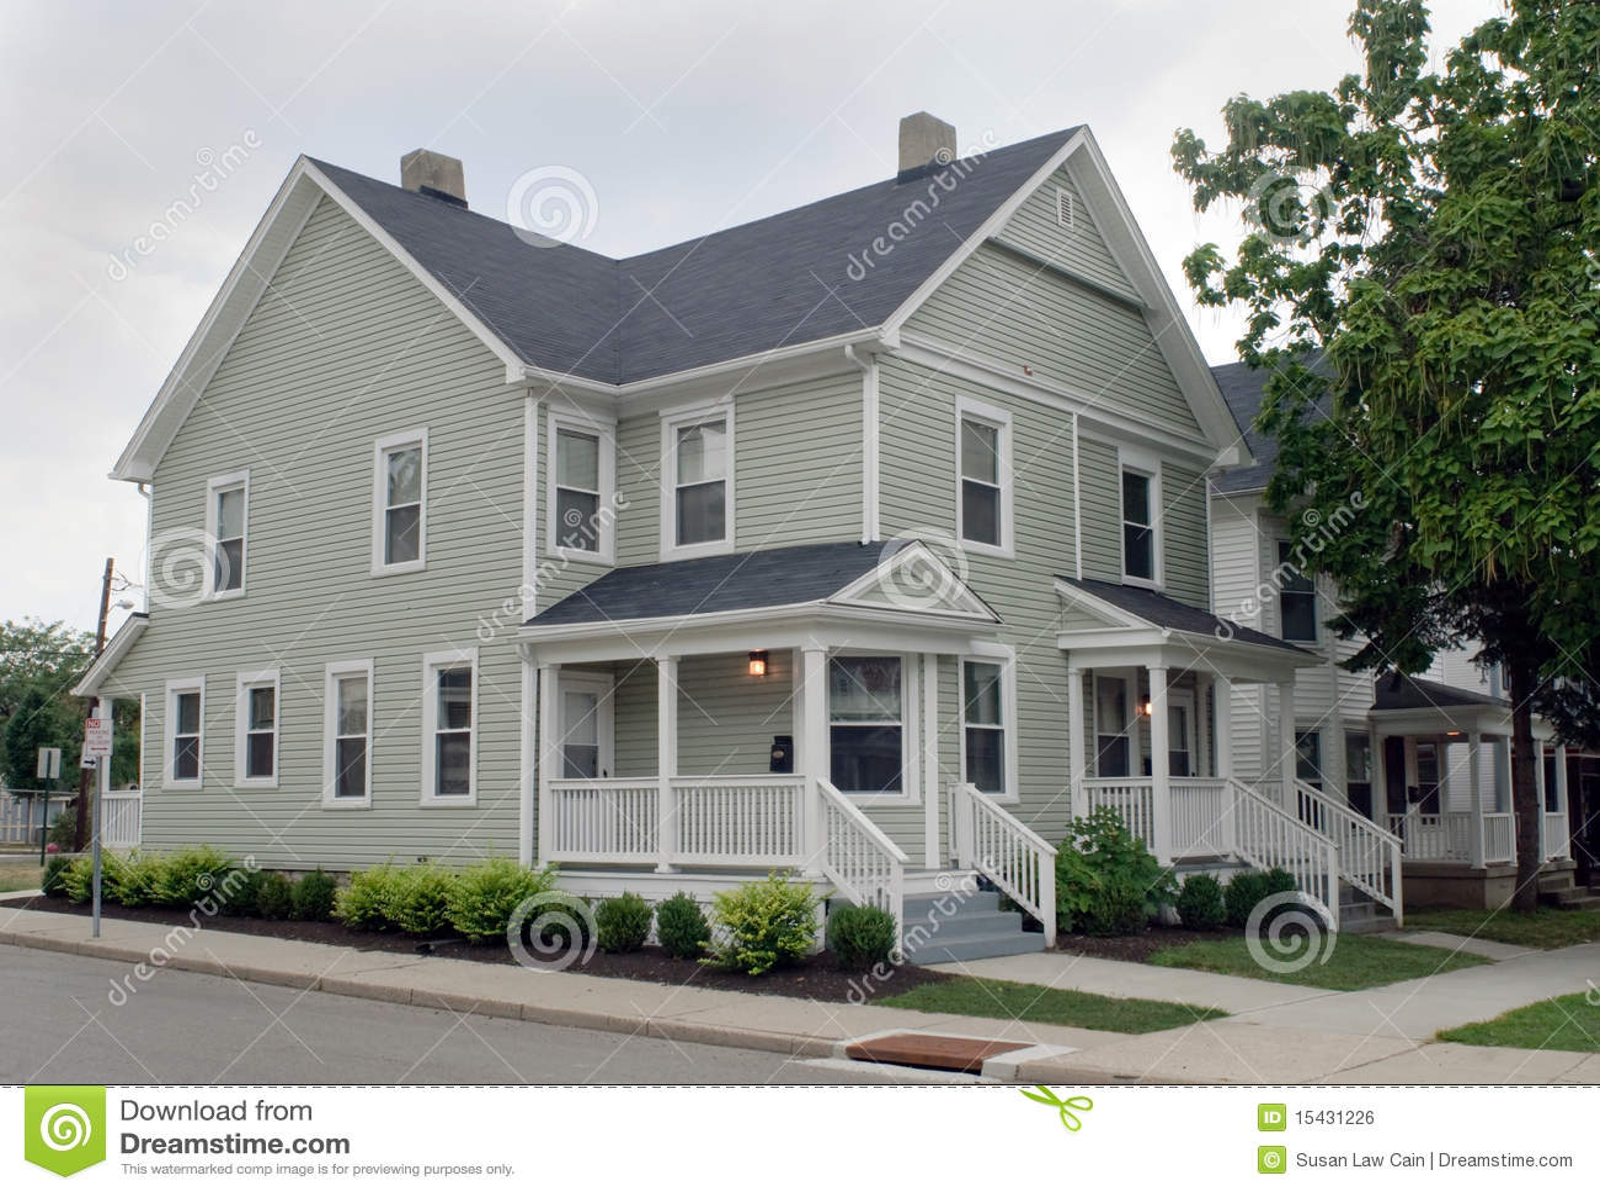 Duplex Homes Stock Image 38452633